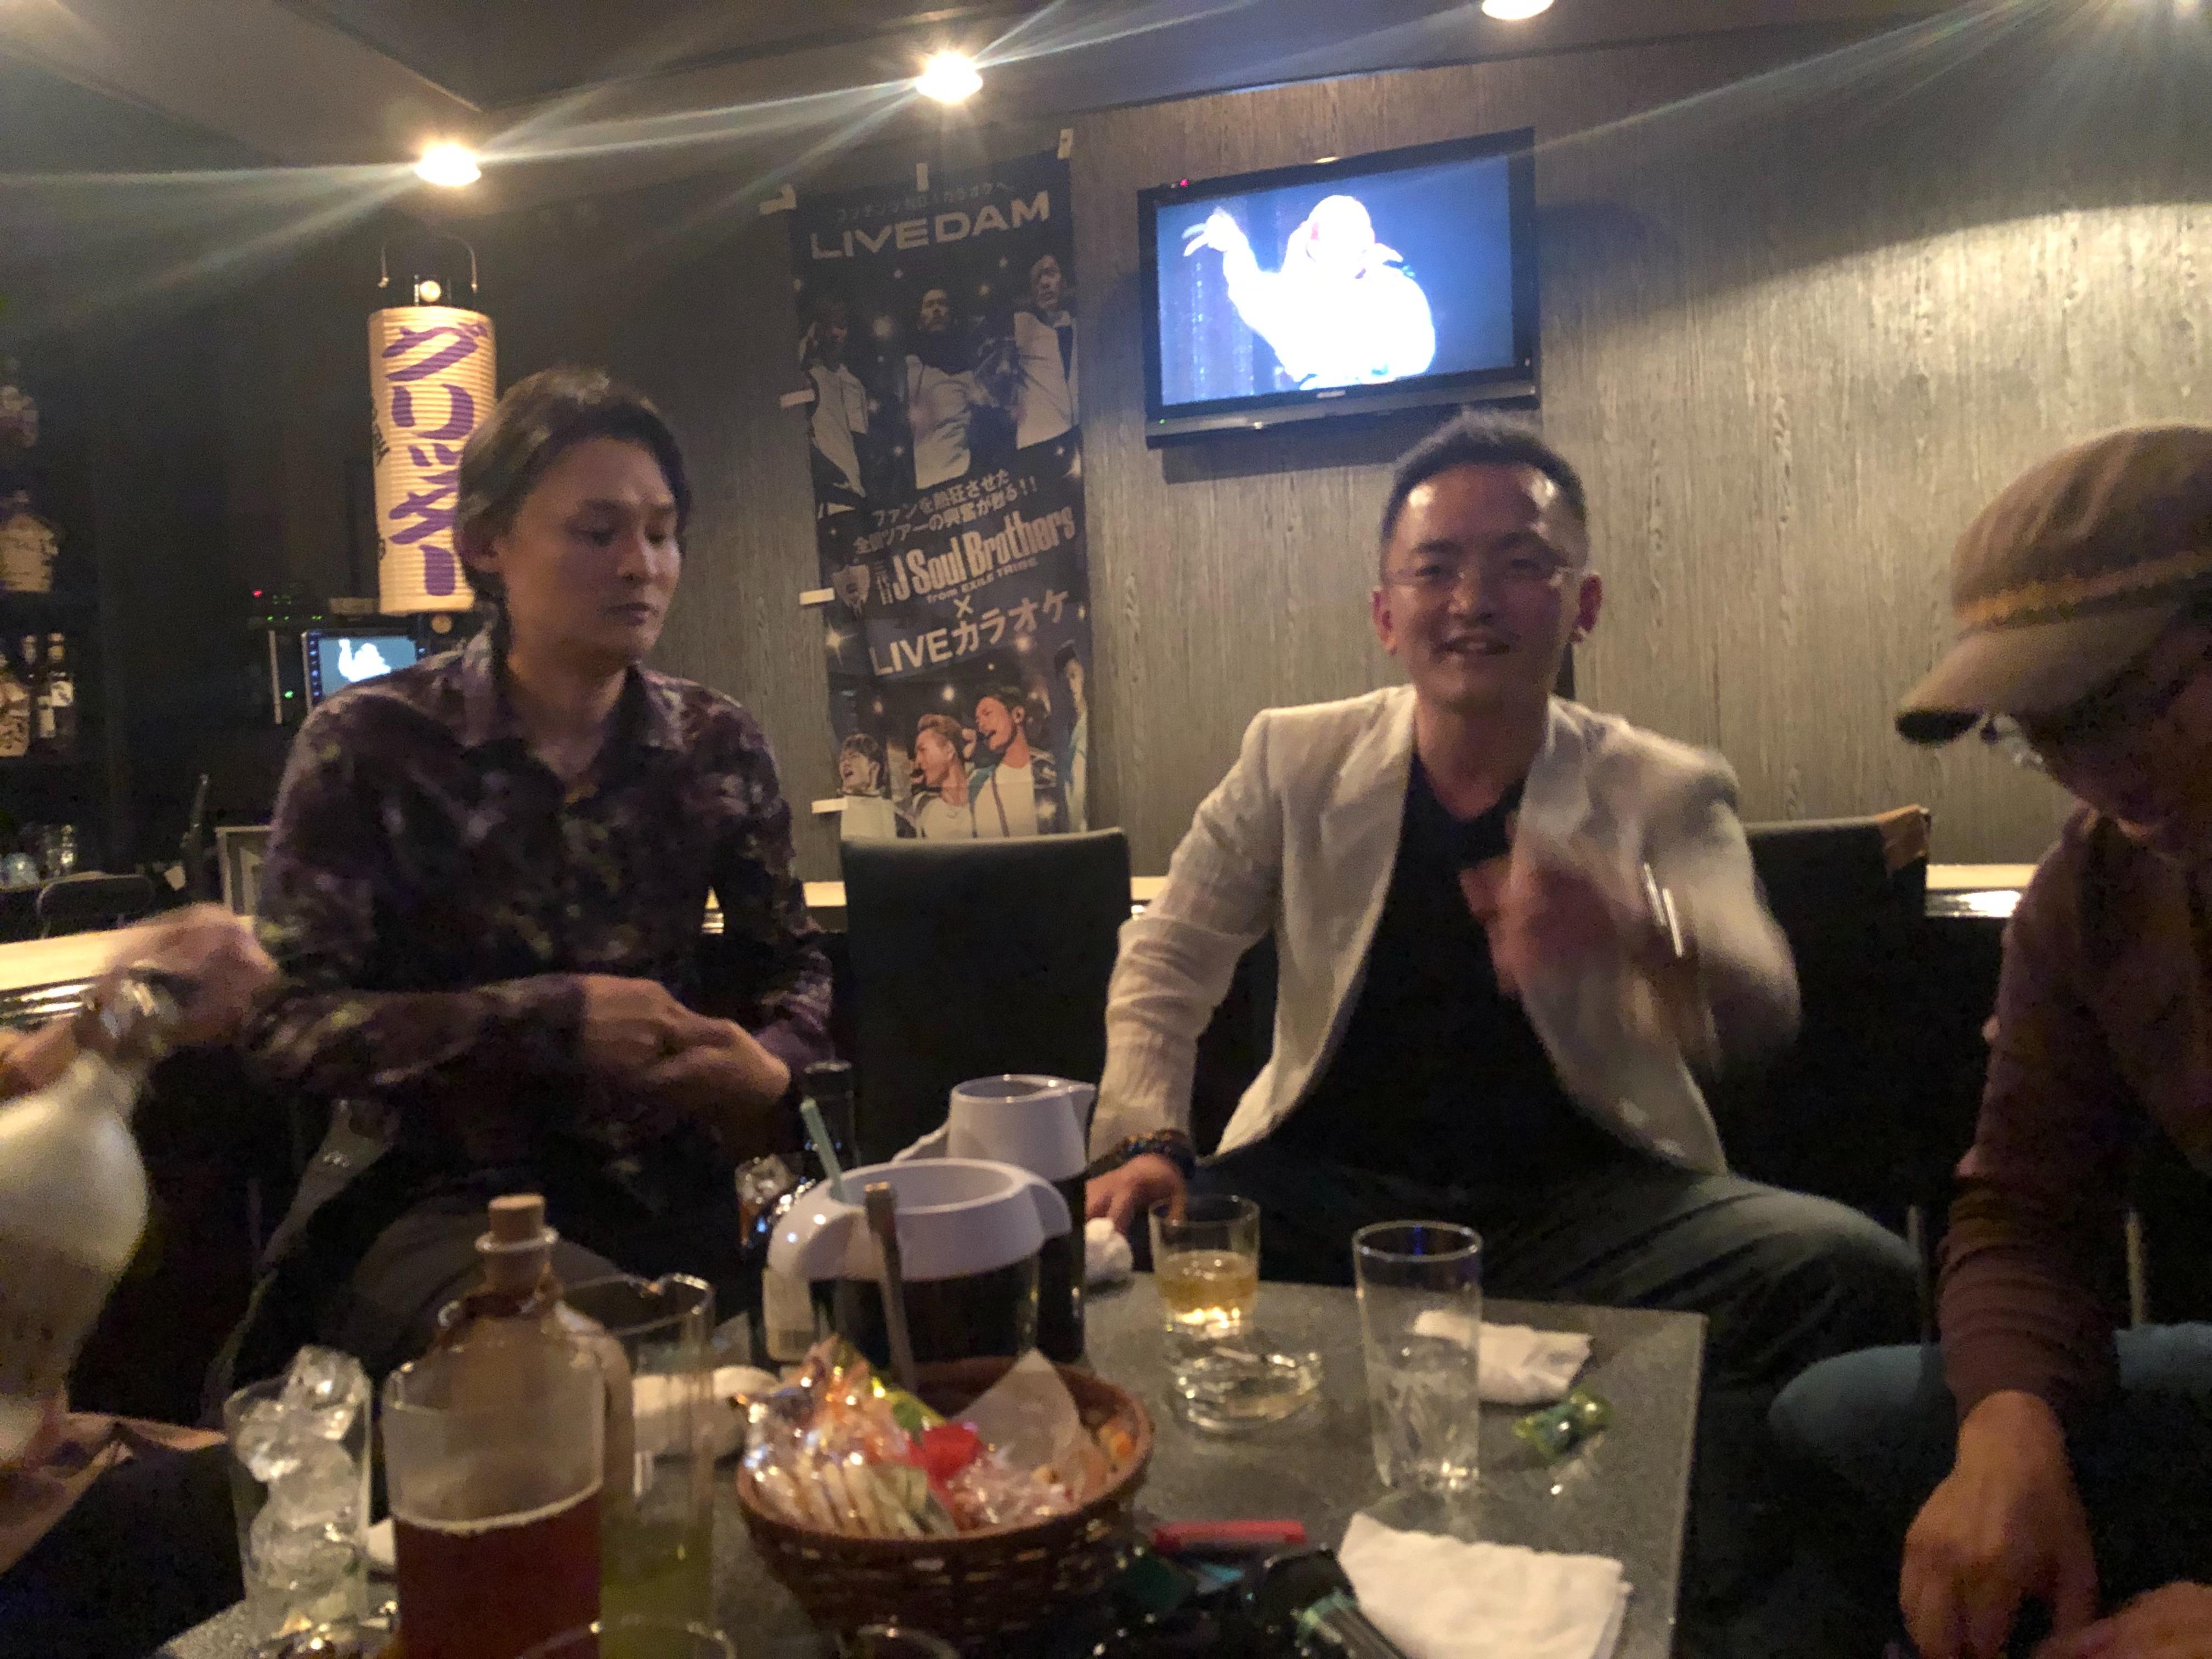 f:id:masanori-kato1972:20190625203457j:image